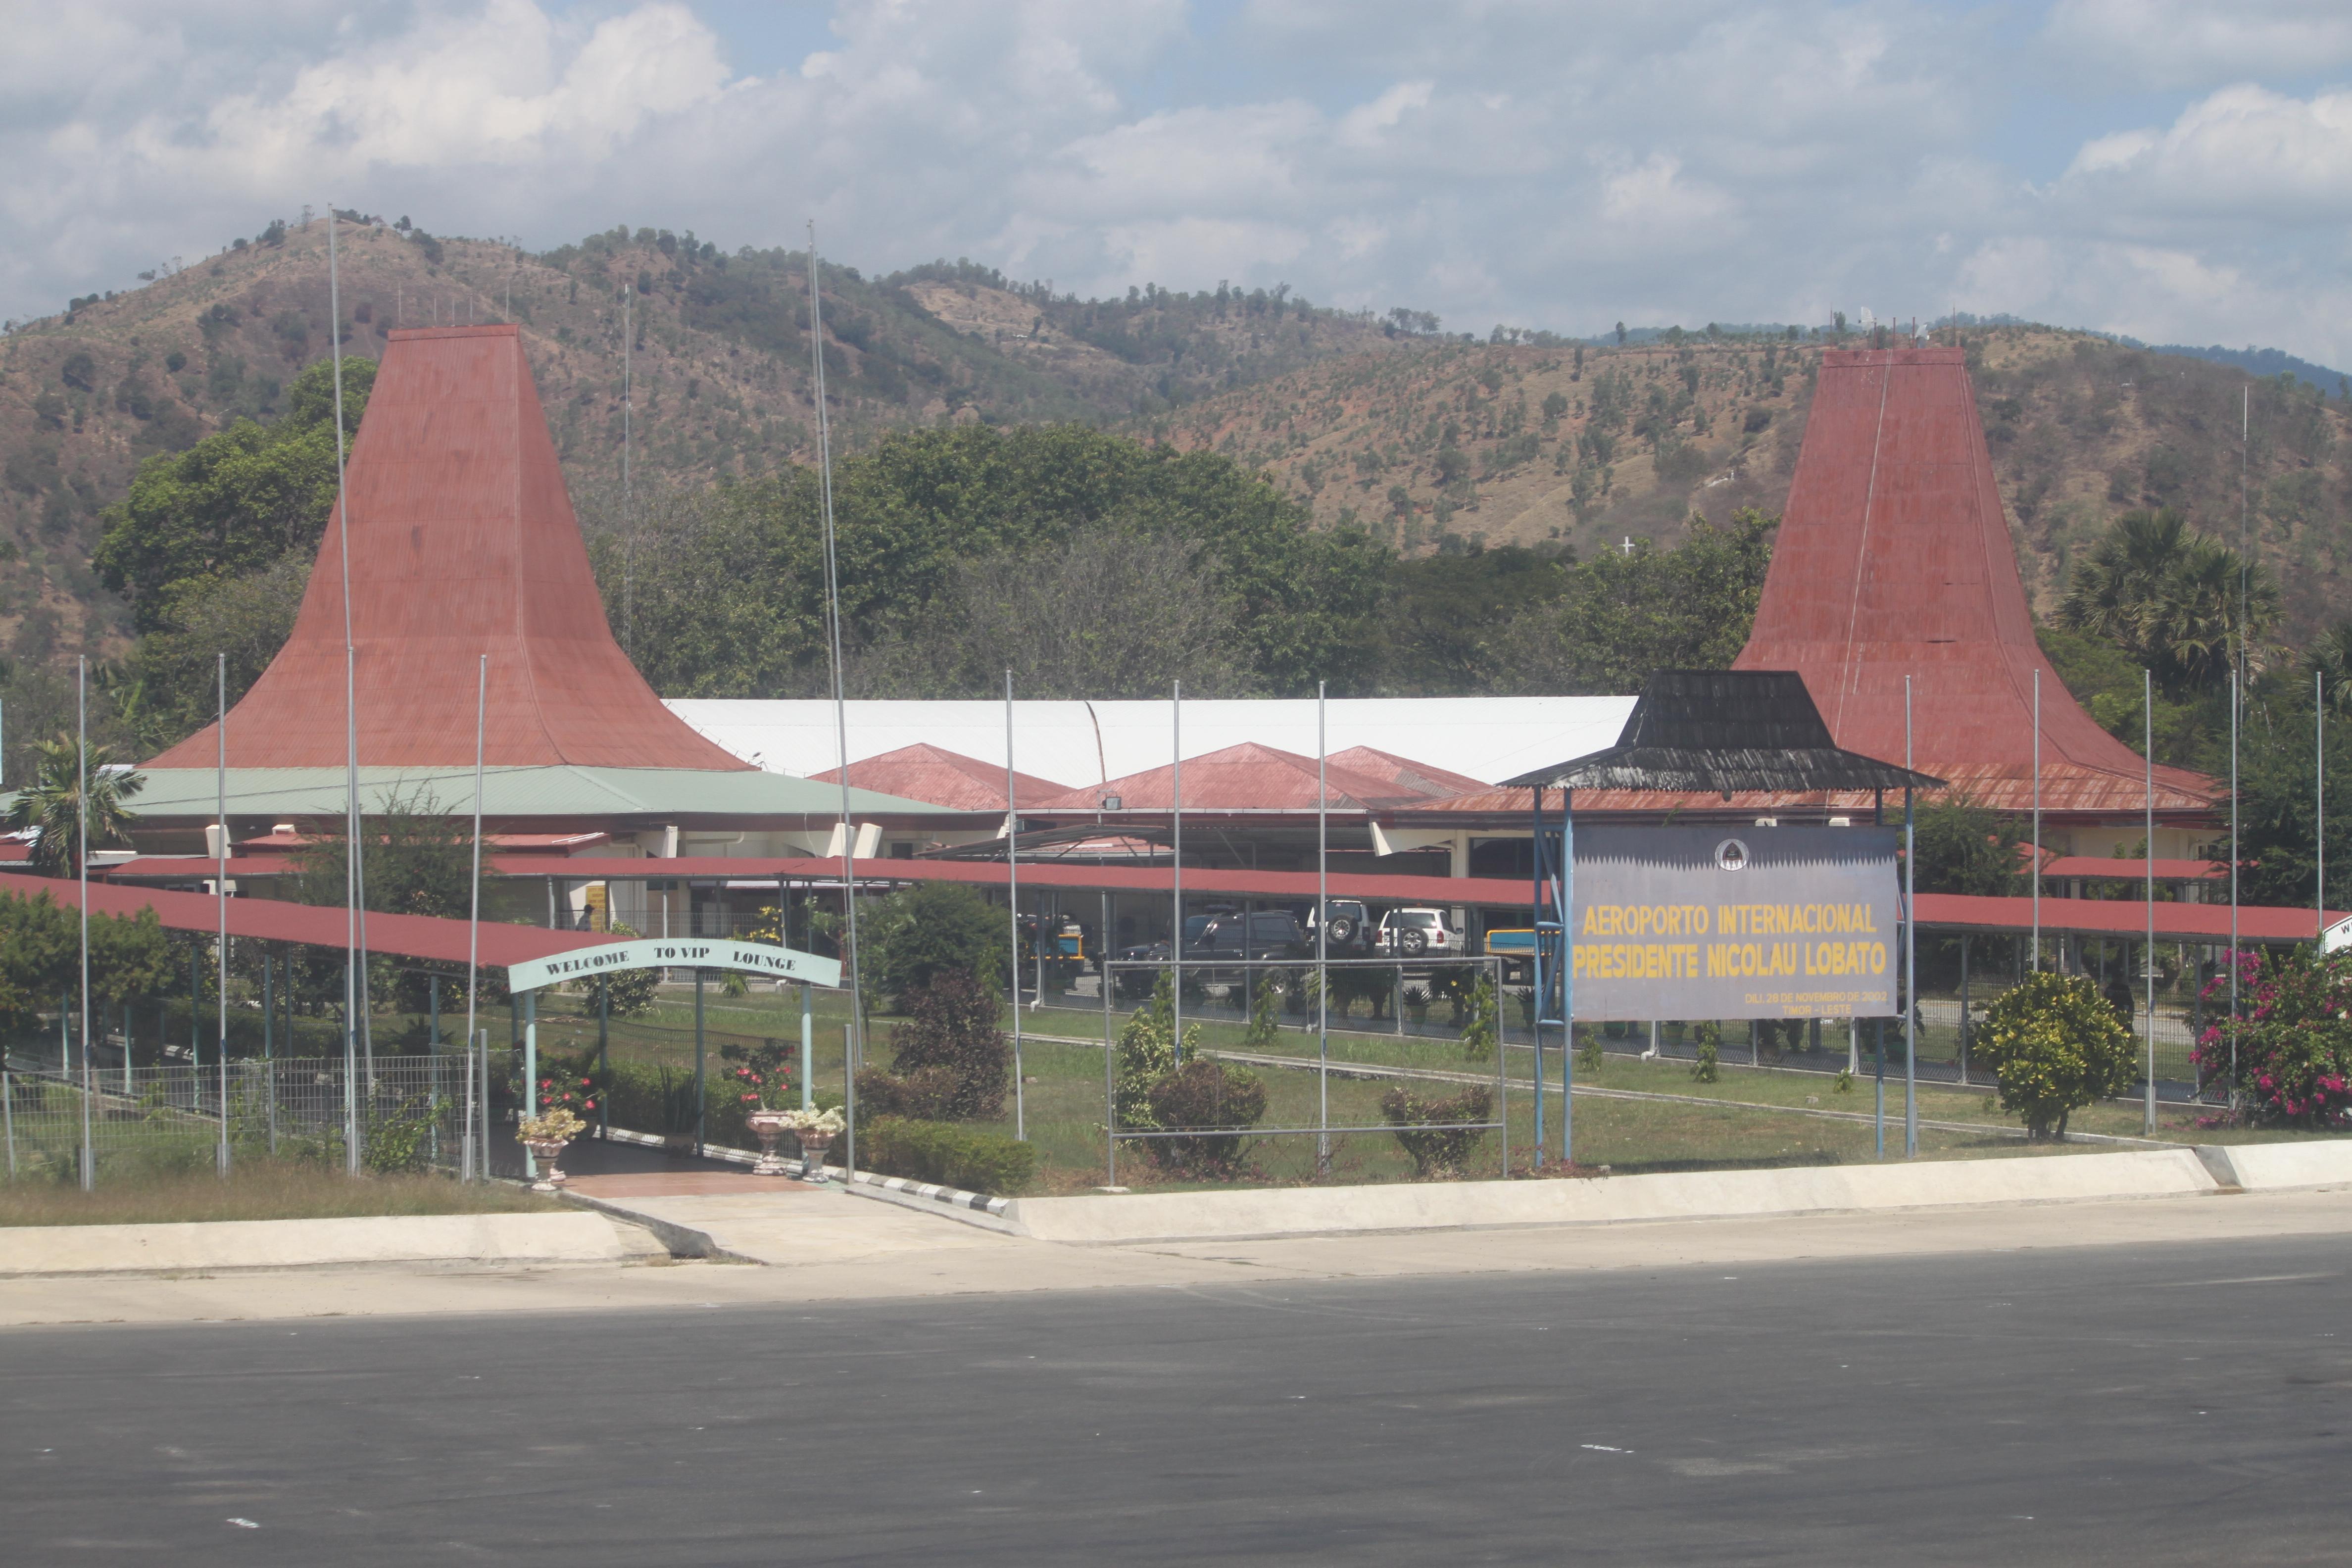 Aeroporto Dili : Dilli timor leste wednesday 20 july angusmccoll